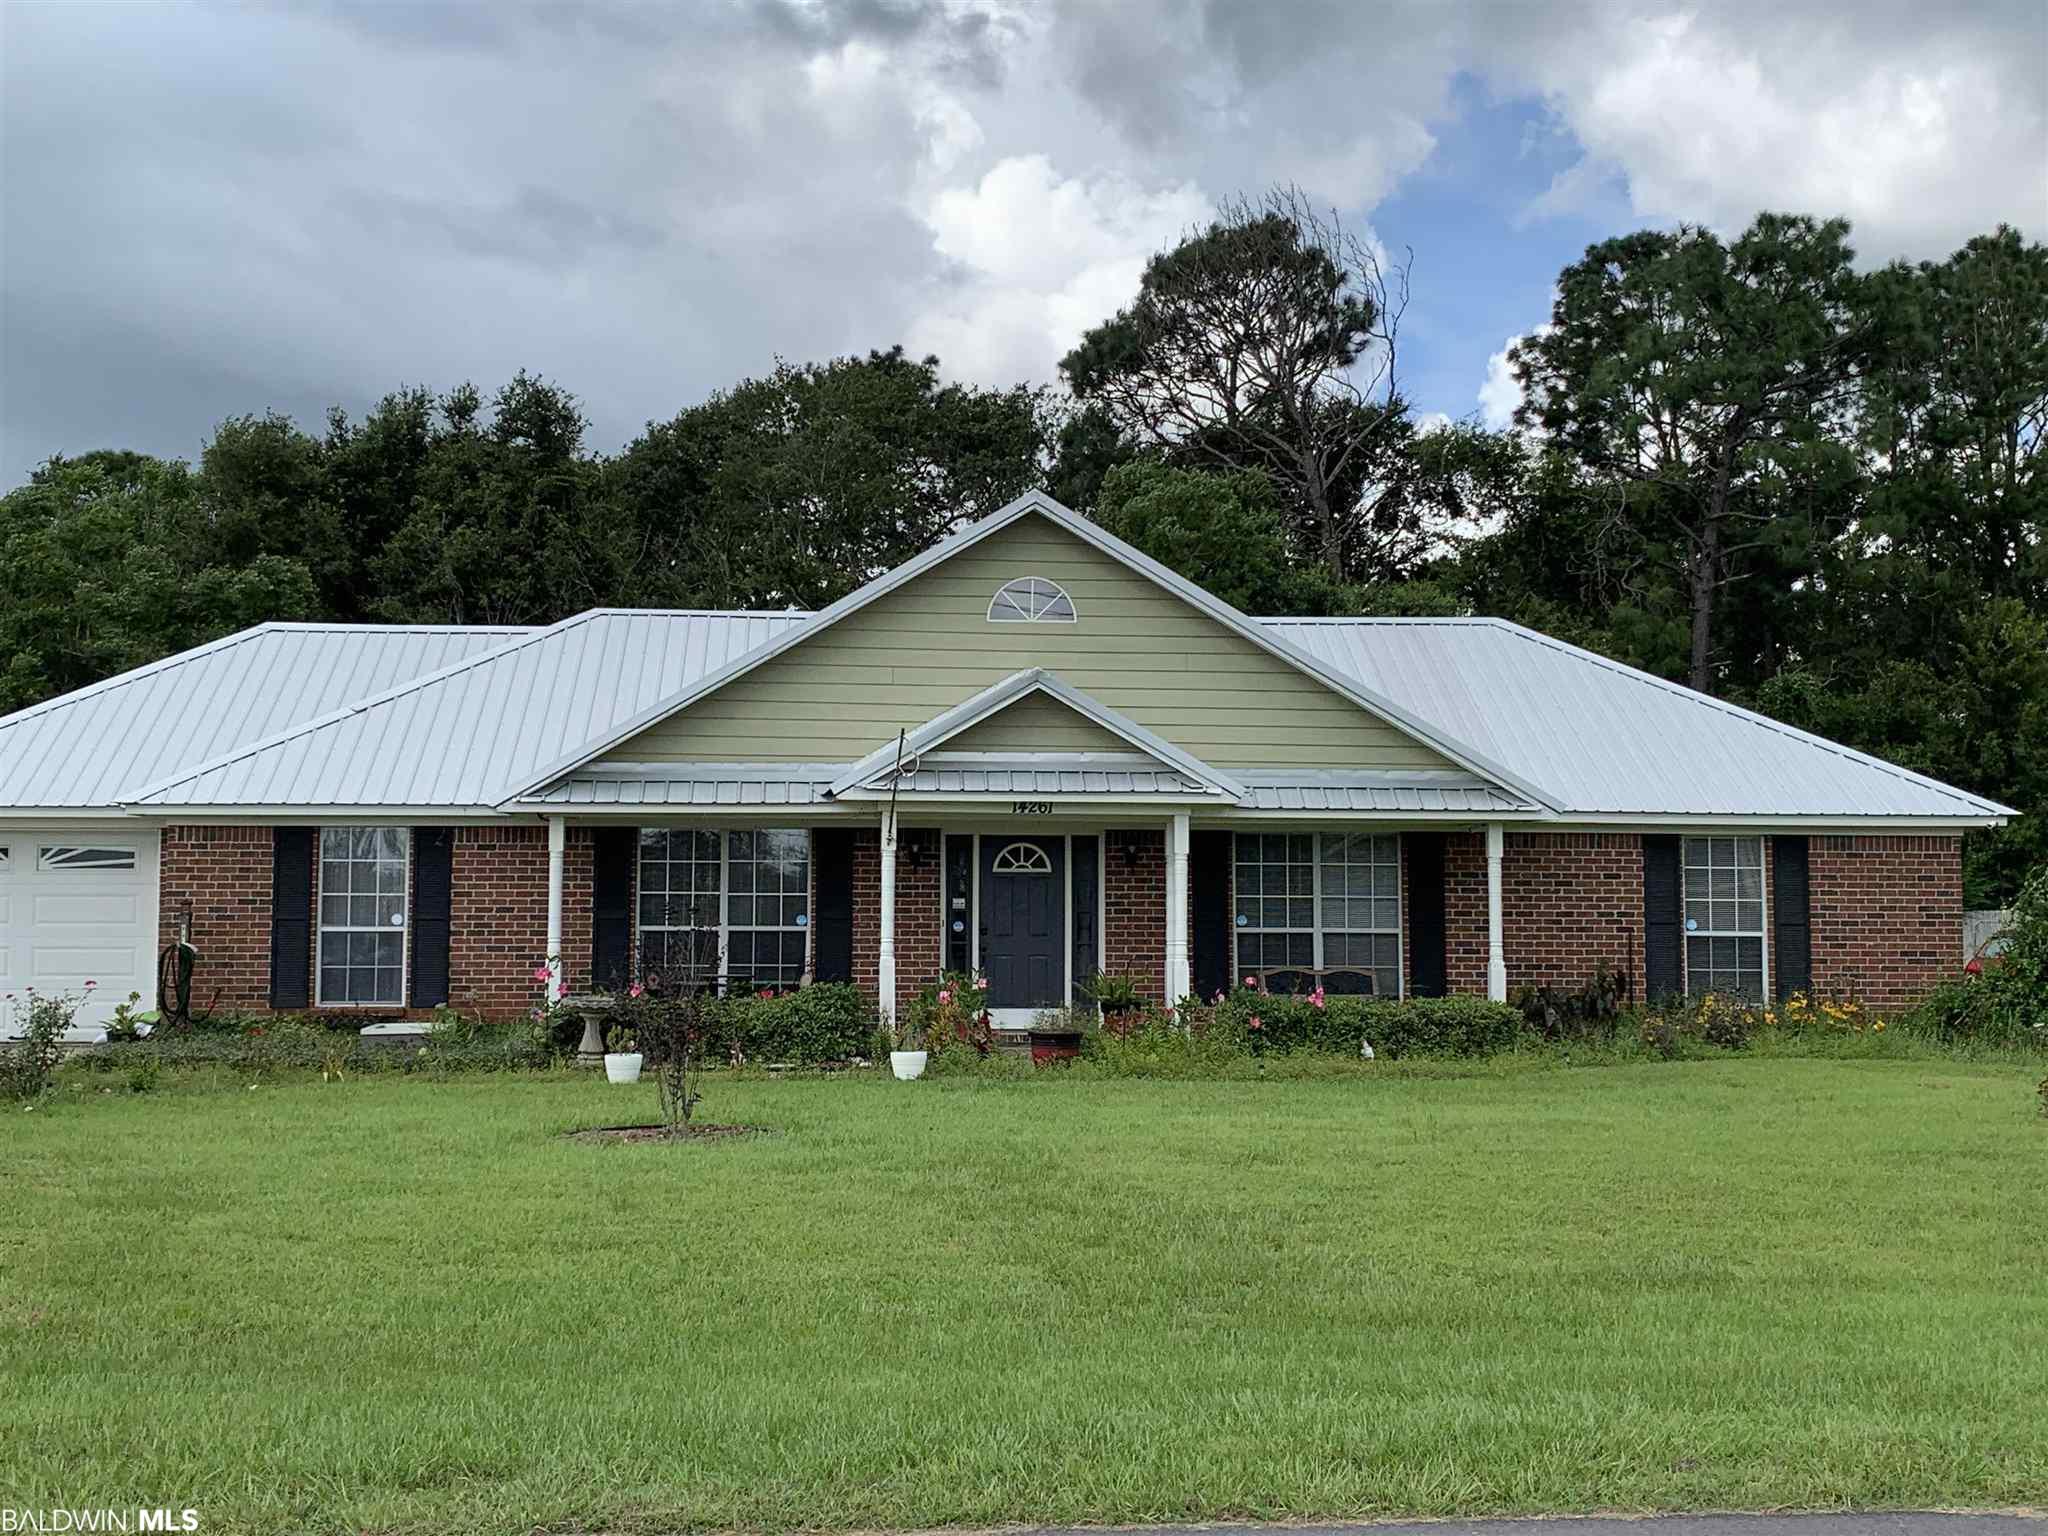 , Alabama listing (Baldwin)